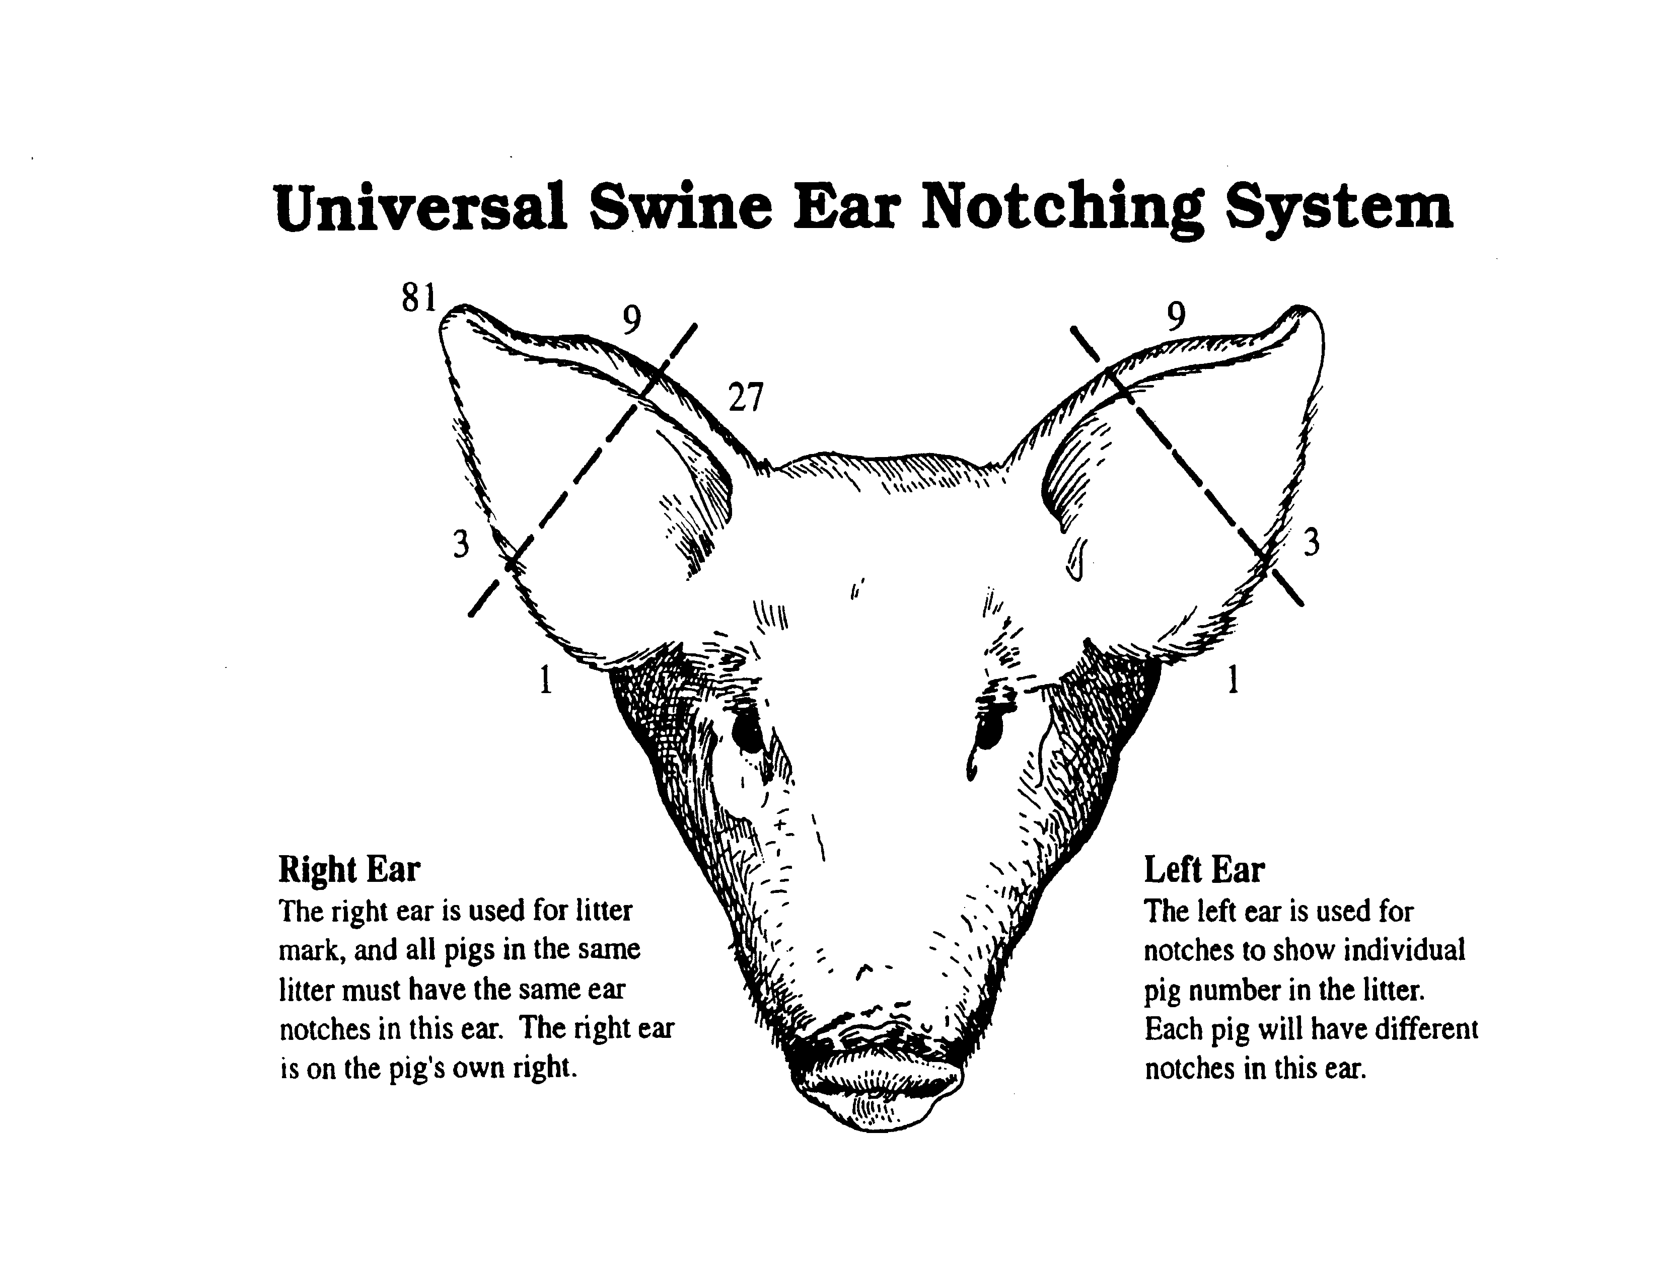 pig ear notches universal swine ear notching system stock show pig skeleton diagram pig ear diagram [ 1660 x 1281 Pixel ]